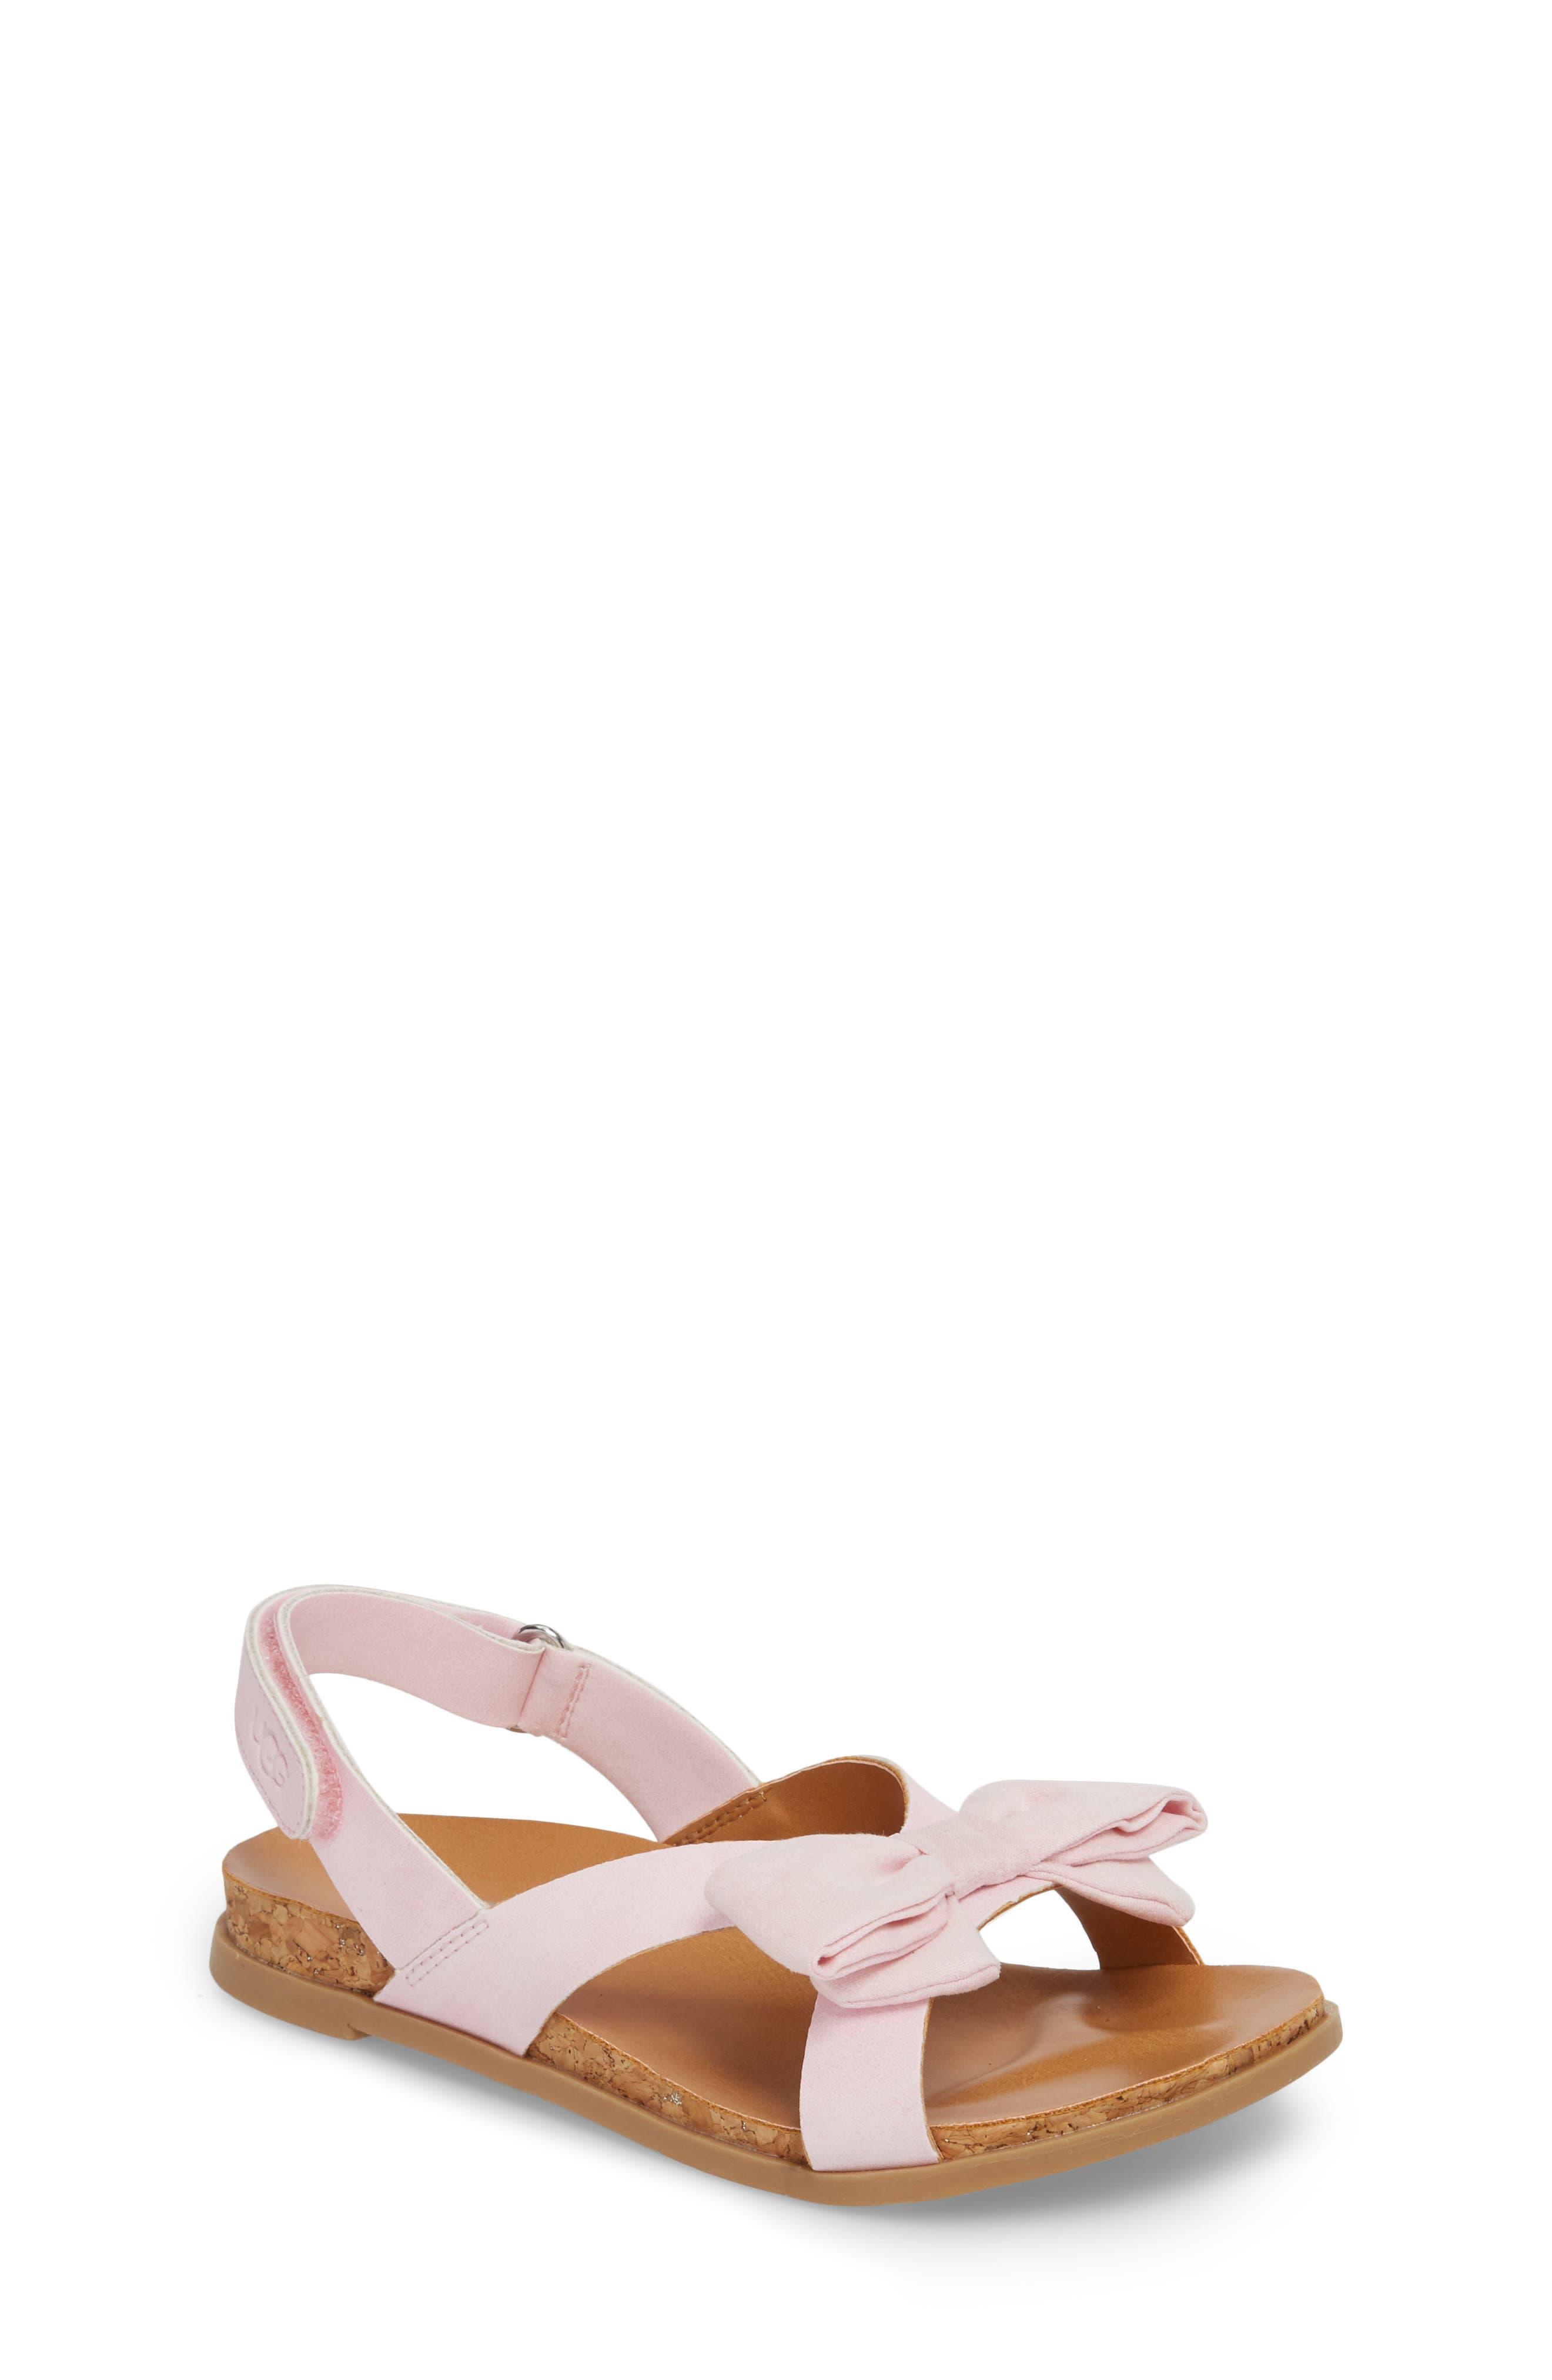 Fonda Sandal,                         Main,                         color, Seashell Pink